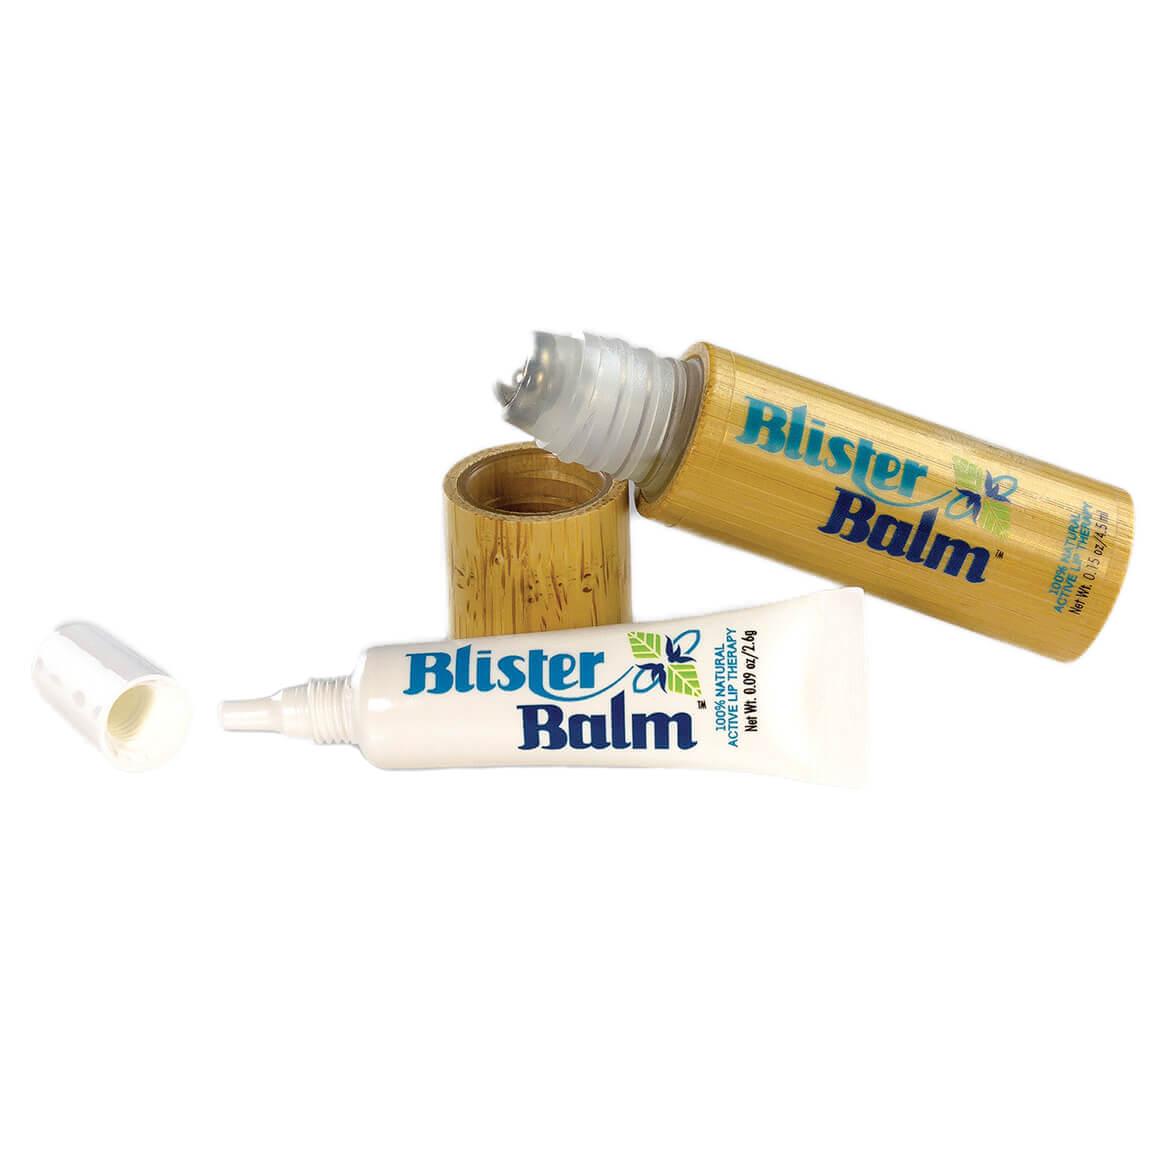 Blister Balm-370203